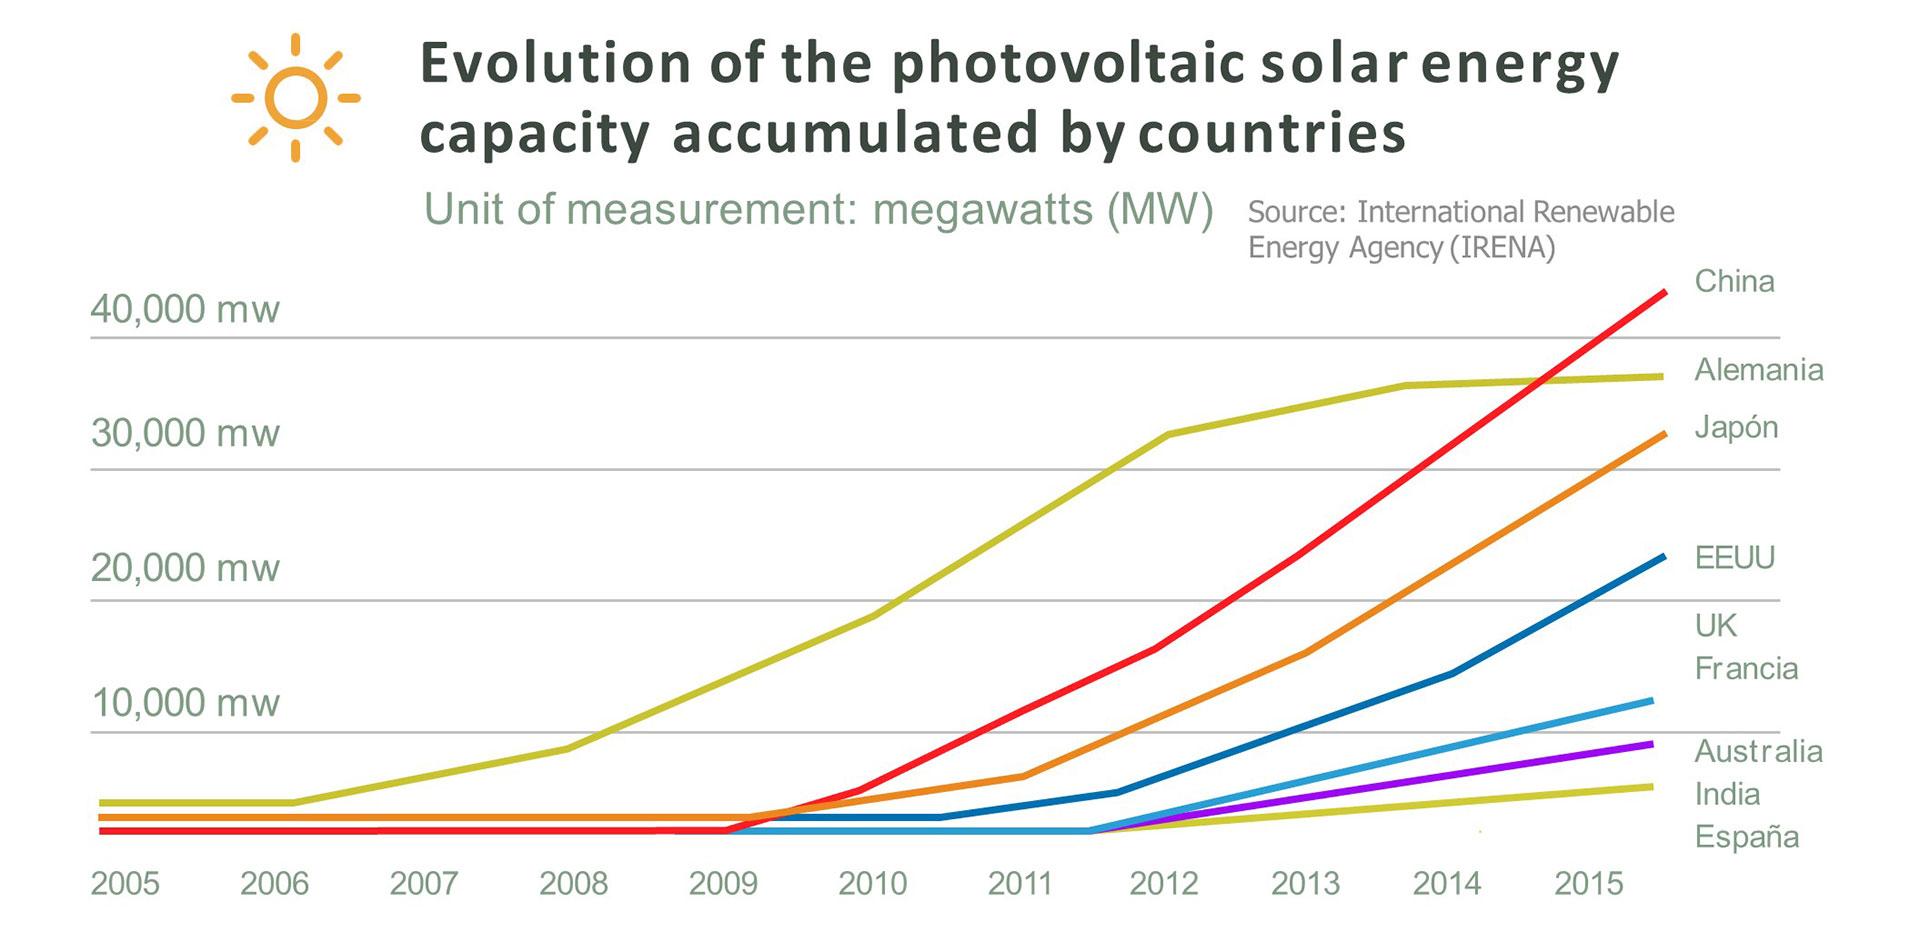 Evolution of photovoltaic solar energy capacity by country, by Doris Capurro.